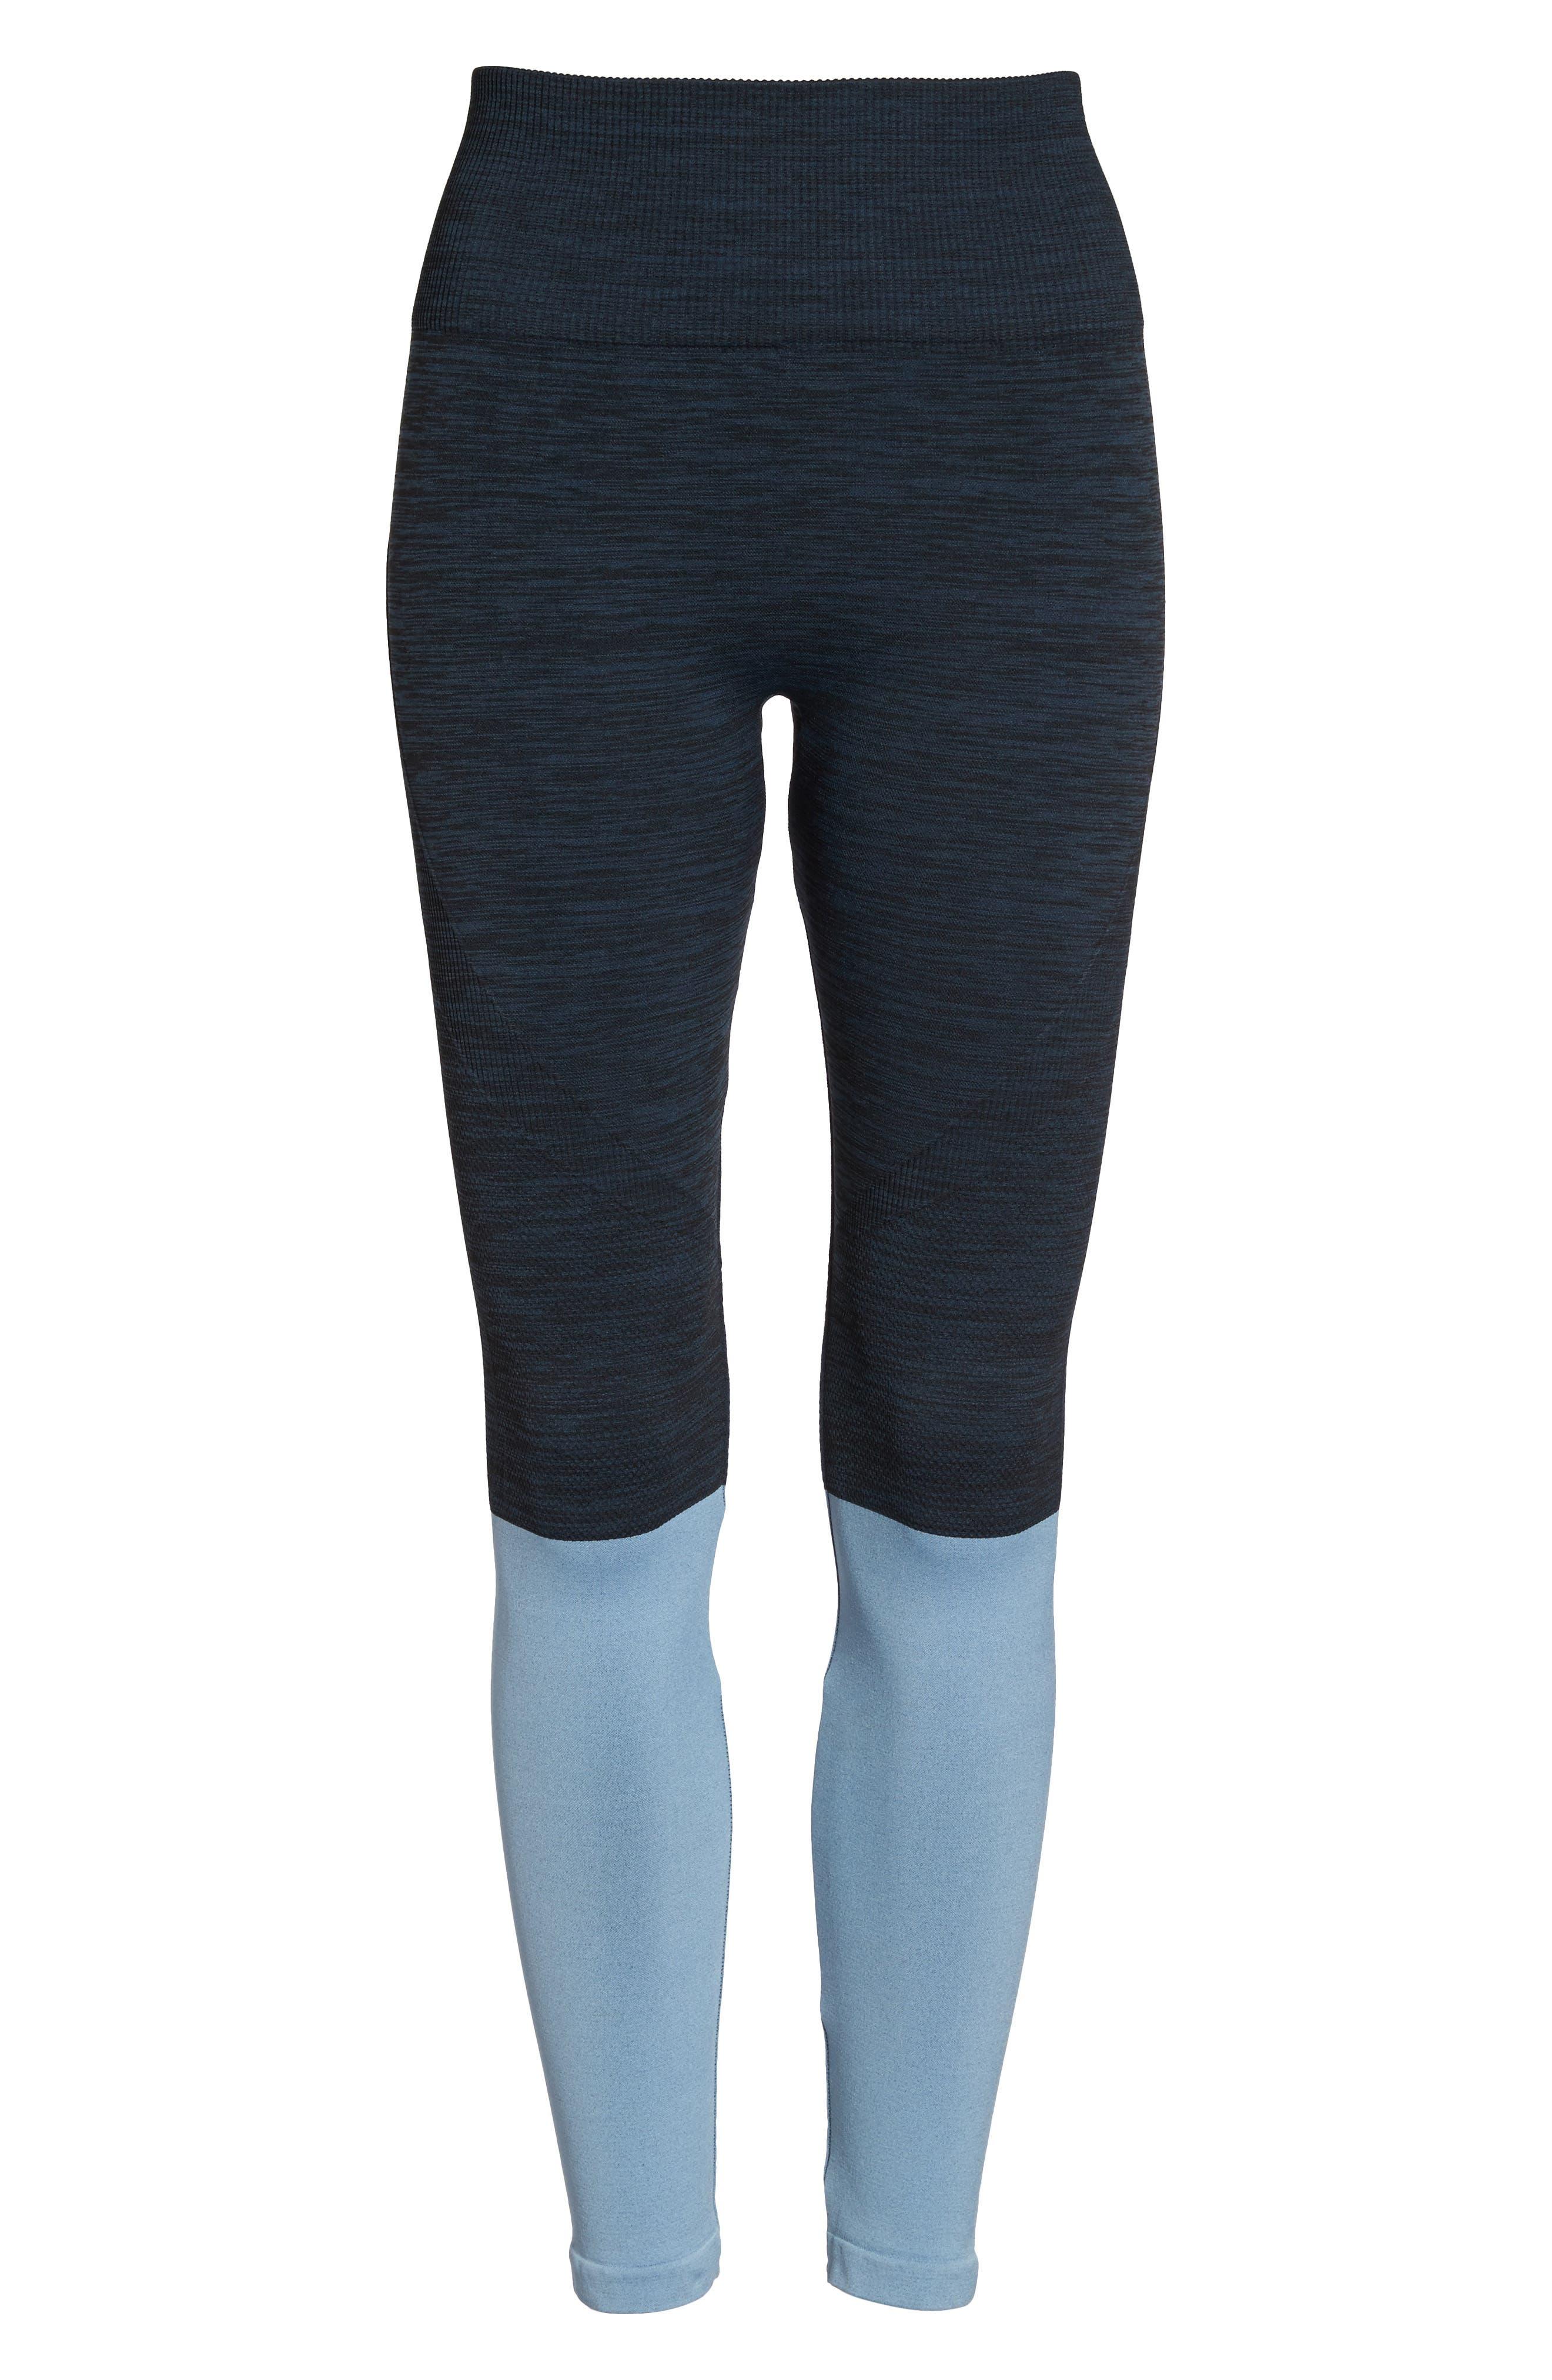 Climawear Liberty Leggings